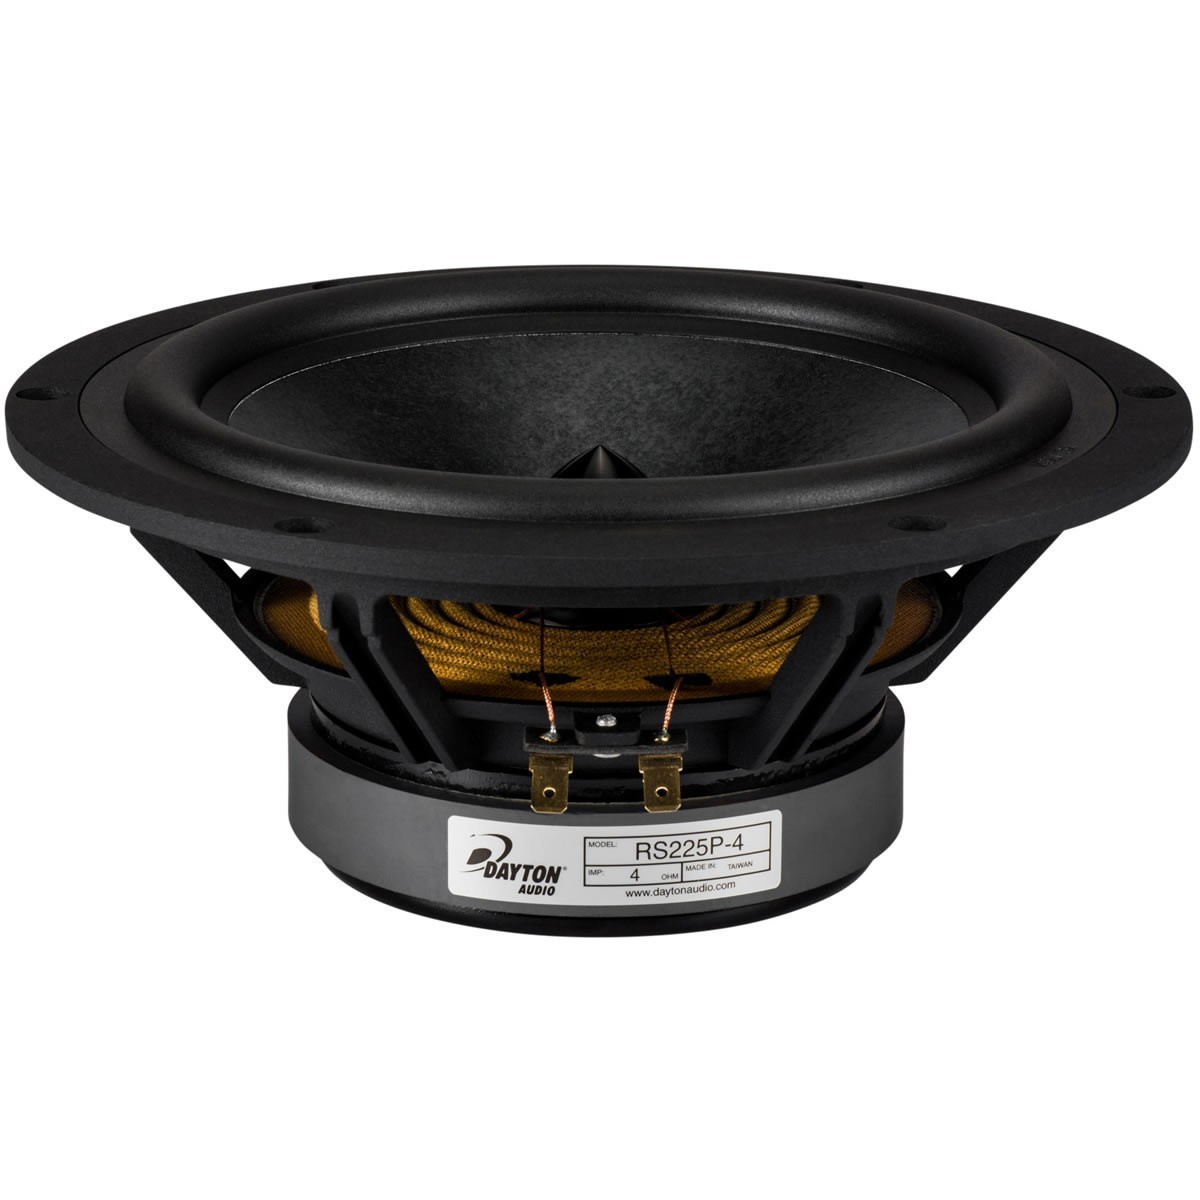 DAYTON AUDIO RS225P-4 Reference Speaker Driver Midbass Paper 80W 4 Ohm 94dB 35Hz - 5500Hz Ø 22cm